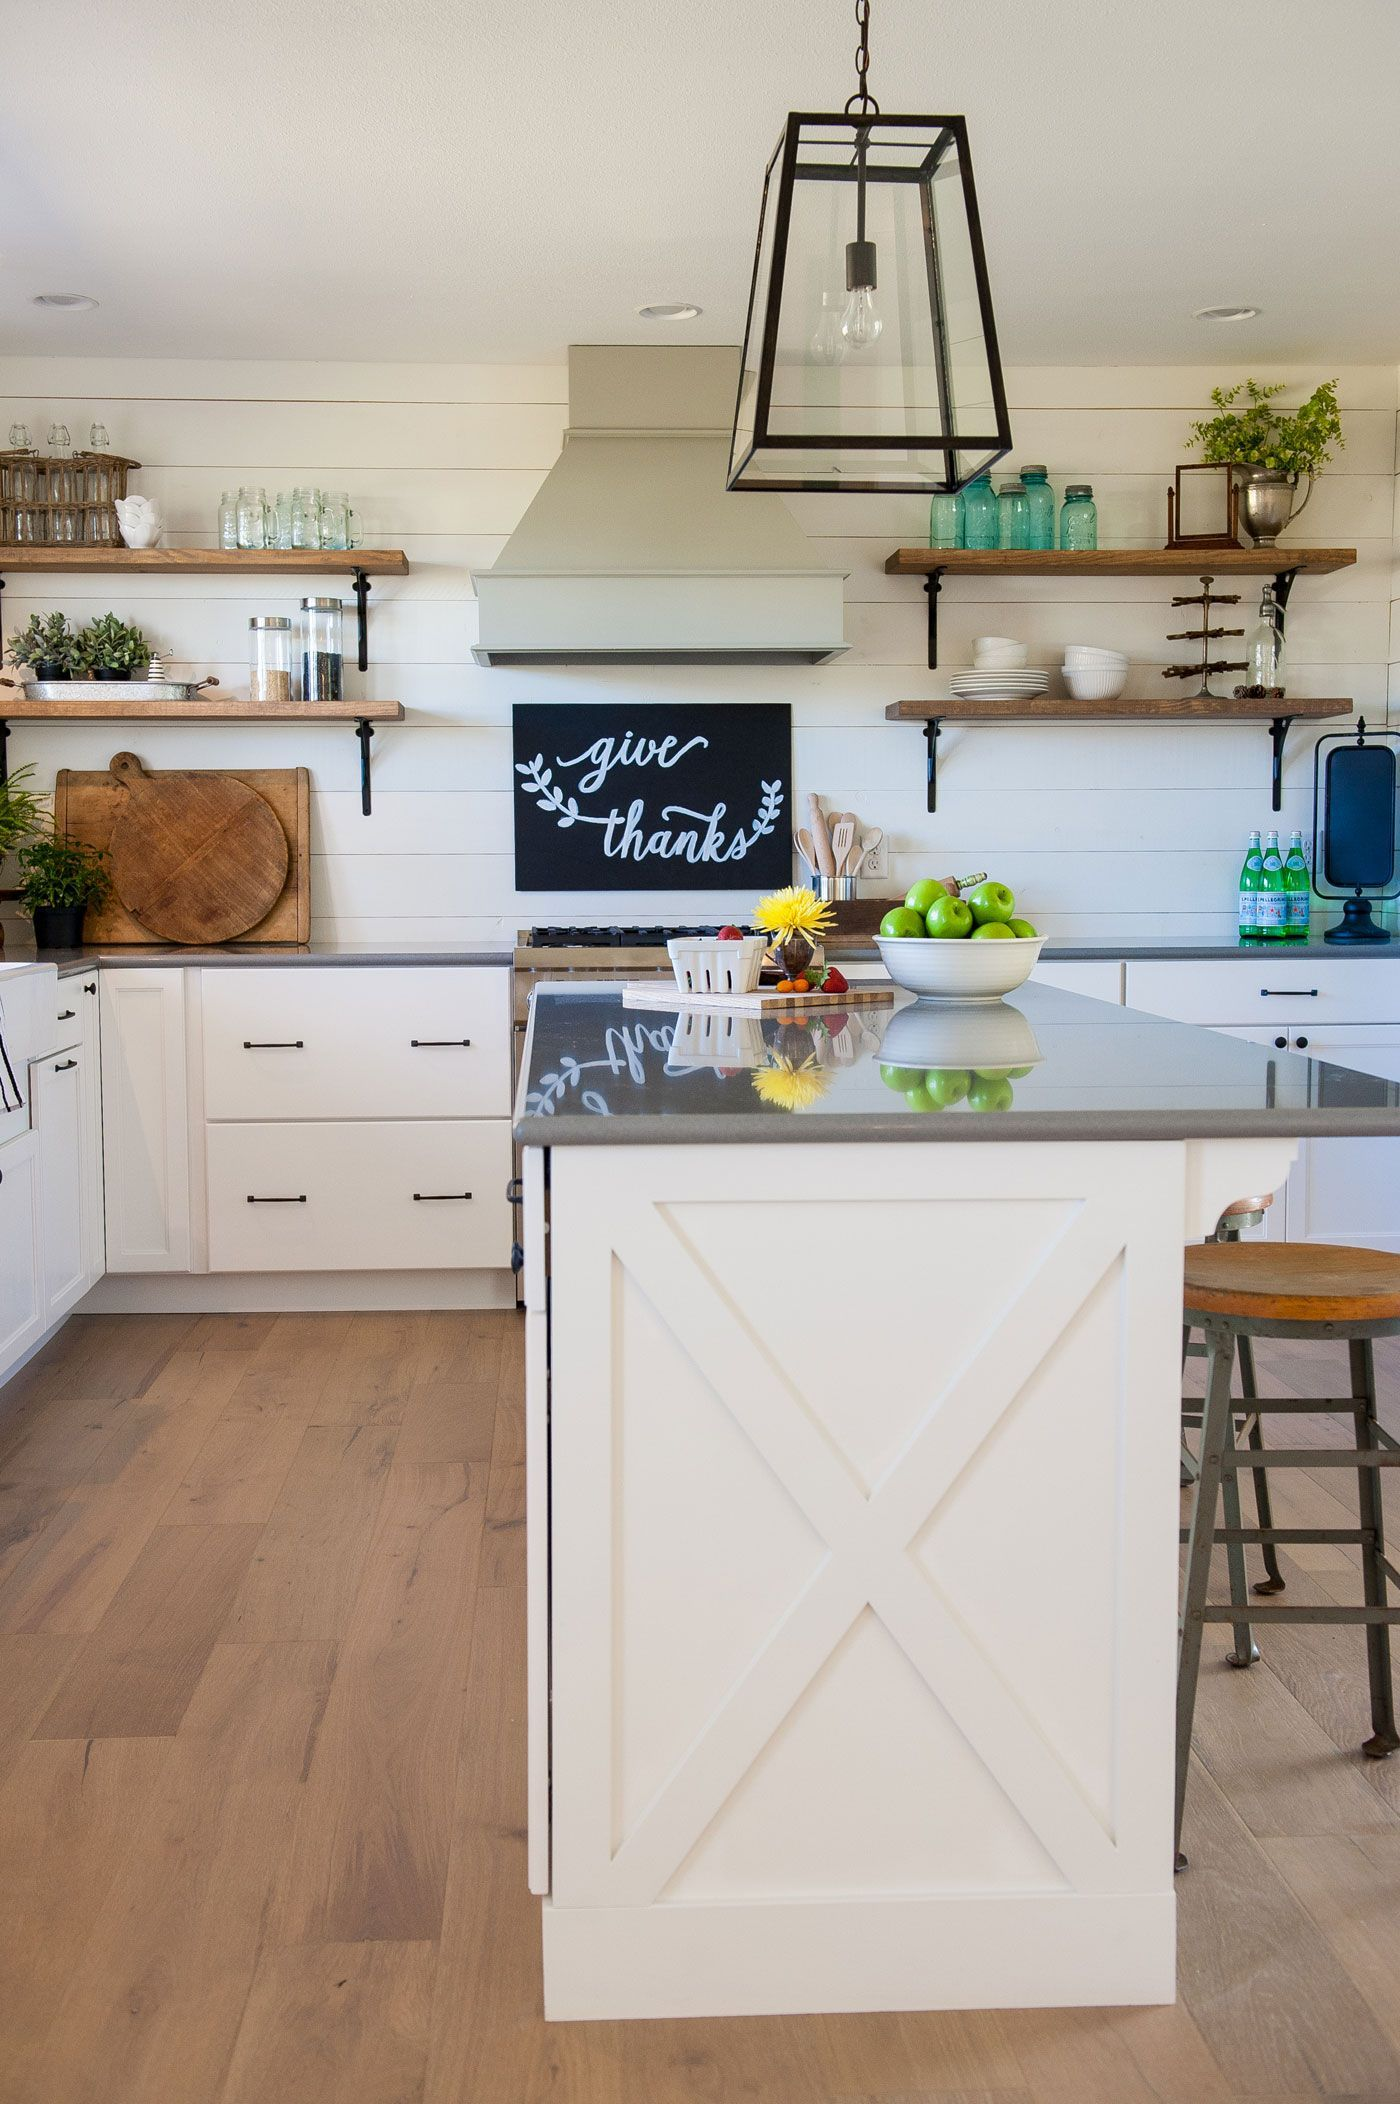 Küchenideen fliesenboden kitchen decor shelves organized pantry rustic kitchen decor for